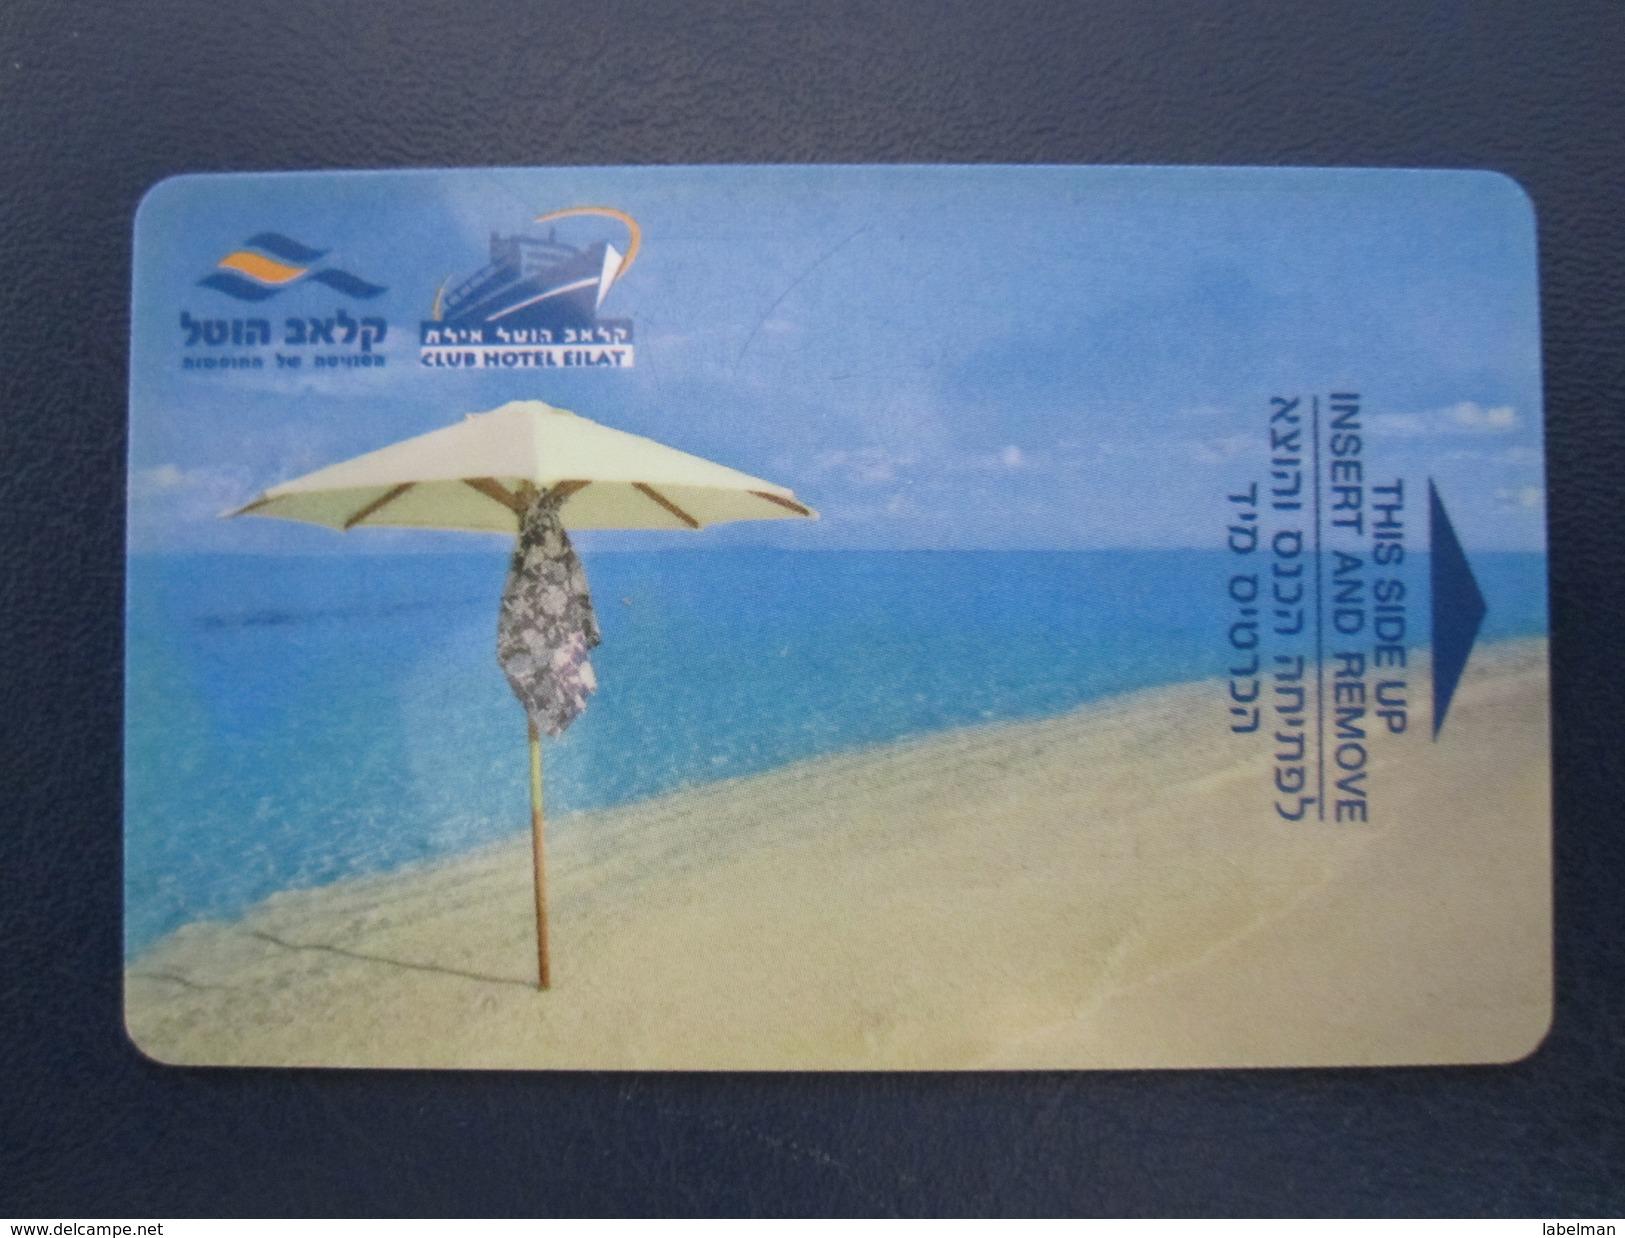 HOTEL MOTEL PENSION MOTOR HOUSE CLUB ELAT TIBERIAS DEAD SEA HAIFA JERUSALEM TIBERIAS EILAT KEY TOWEL CARD ISRAEL - Hotel Labels